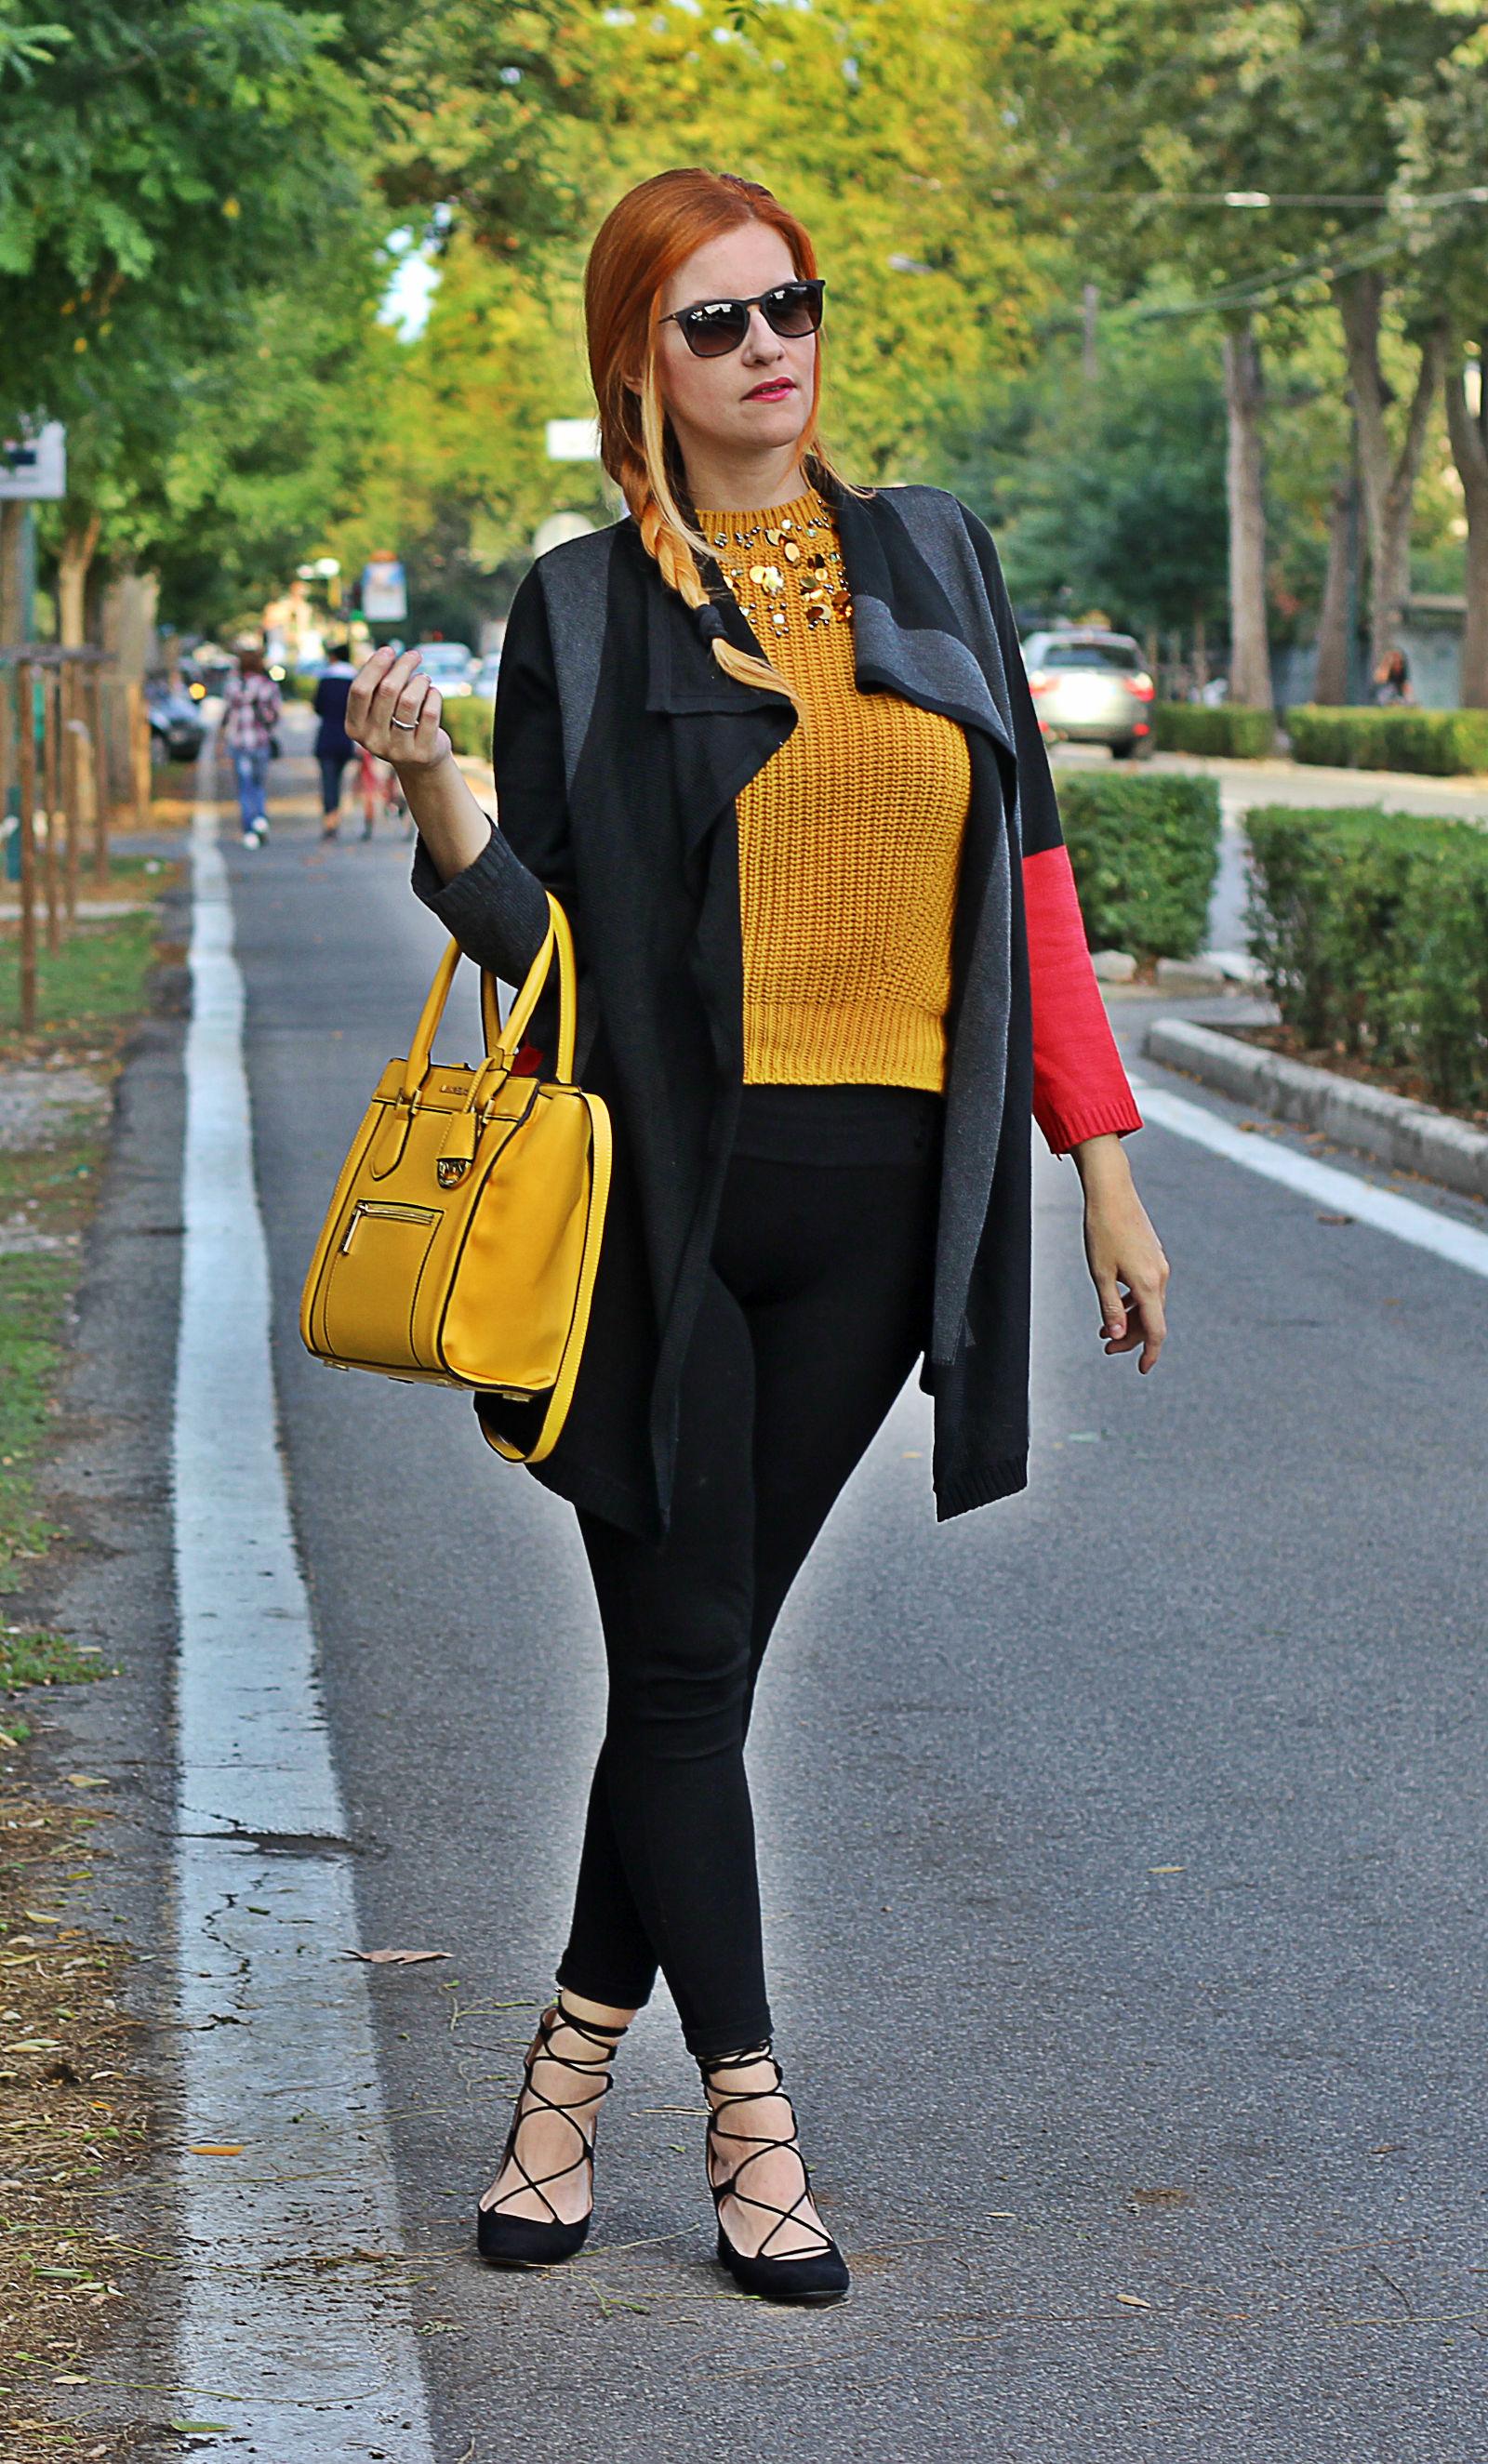 look comfy scarpe lace up elisabetta bertolini outfit fashion blog